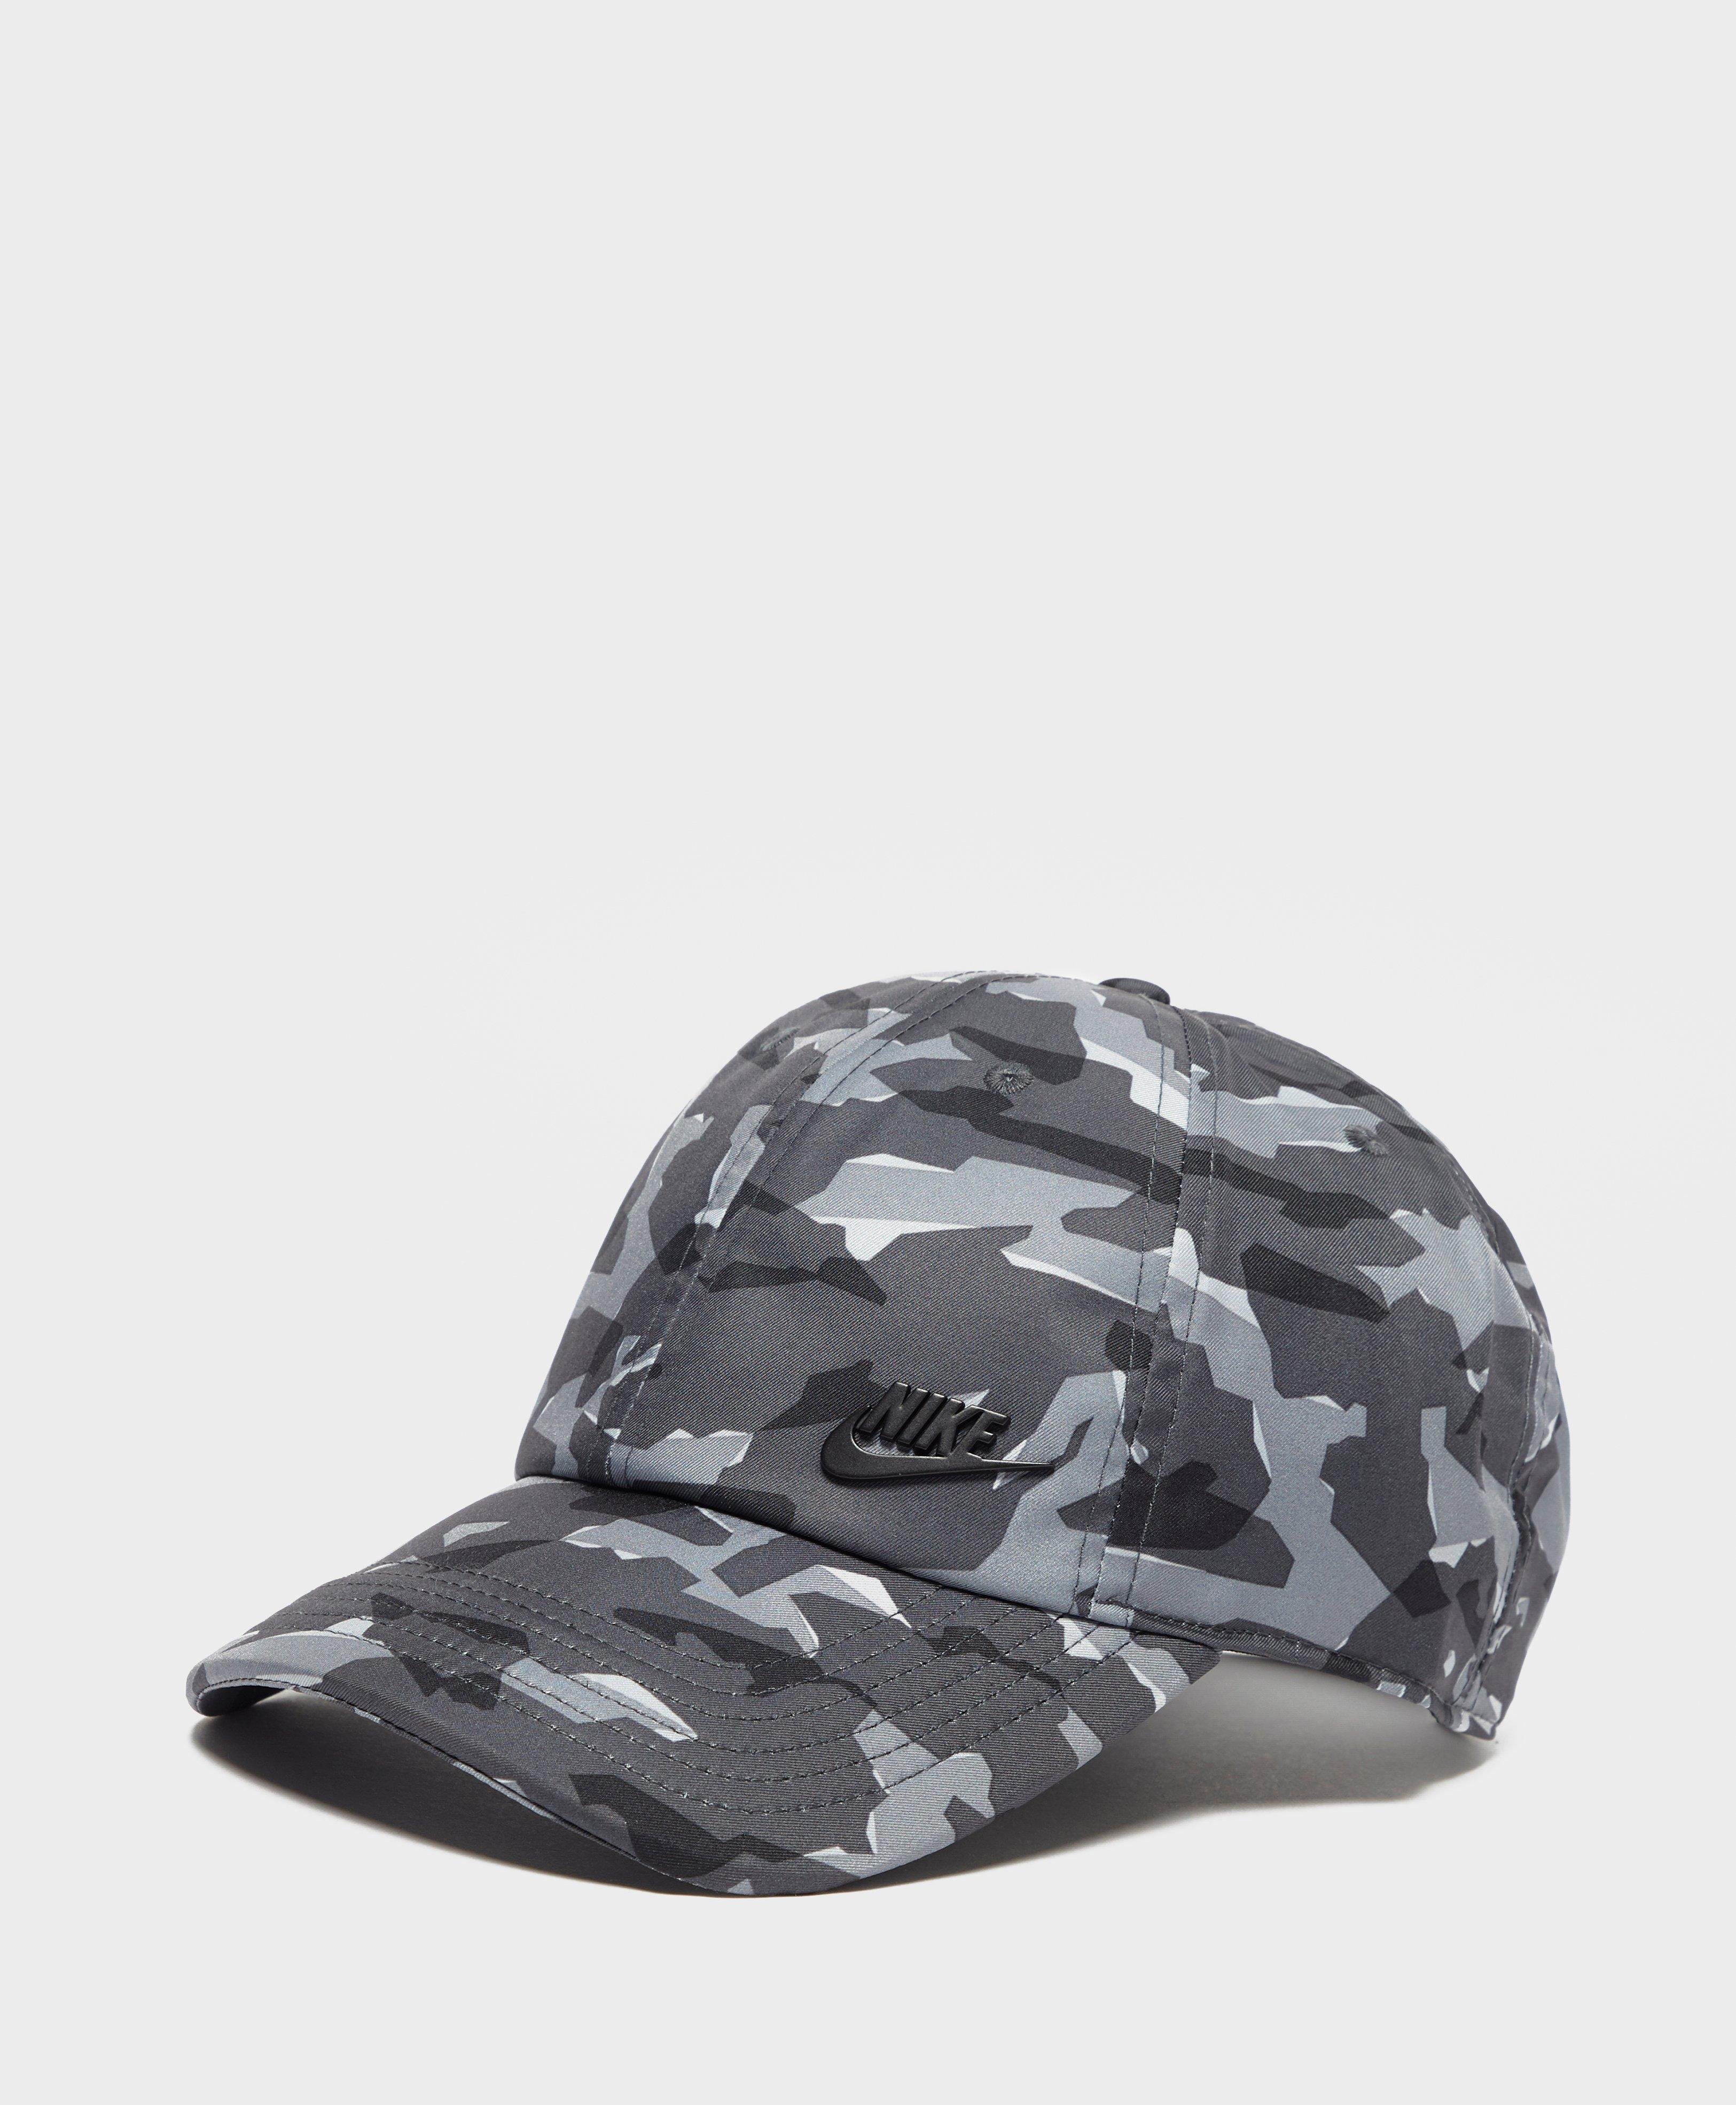 Nike Futura Camo Cap in Gray for Men - Lyst 9a0dde09af80